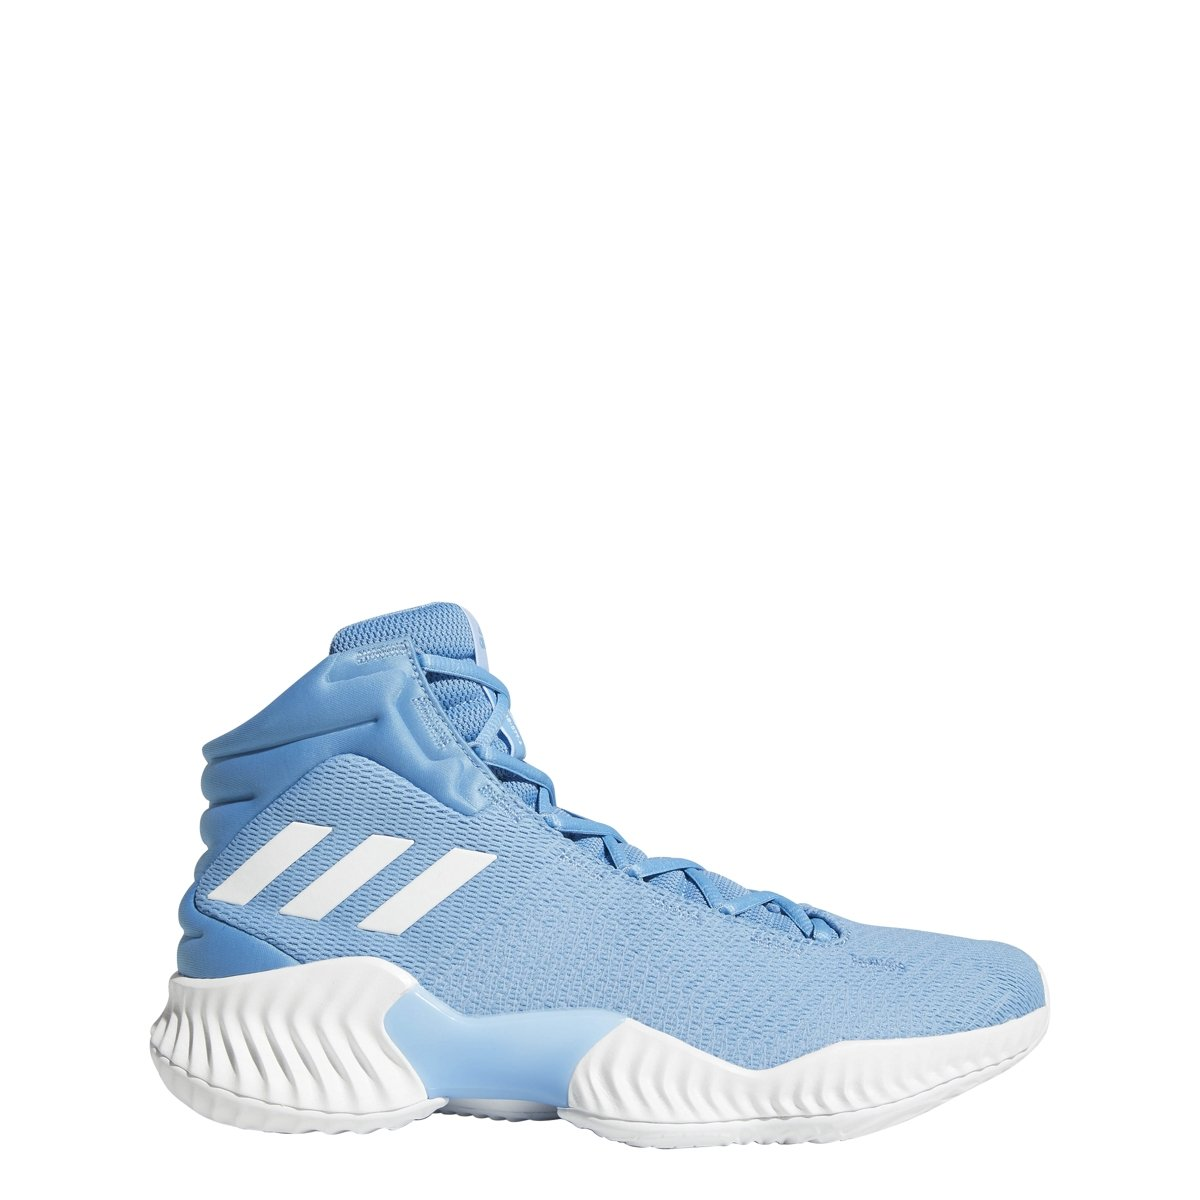 adidas Men's Pro Bounce 2018 Basketball Shoe B077X953RY 12.5 D(M) US|Light Blue/White/Light Blue